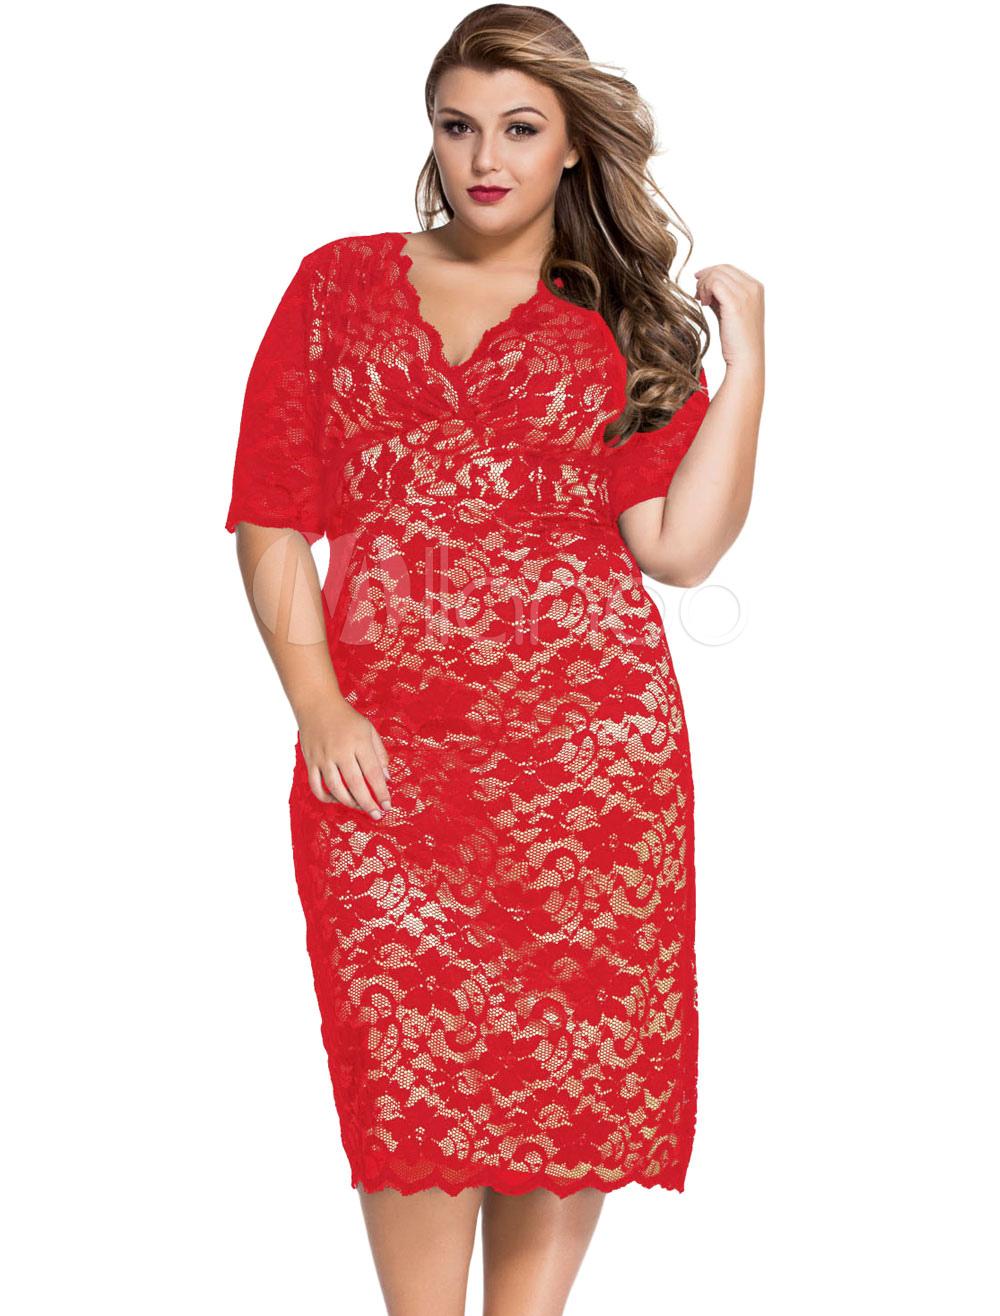 Red Plus Size Dress Lace Midi Knee-Length Dress - Milanoo.com